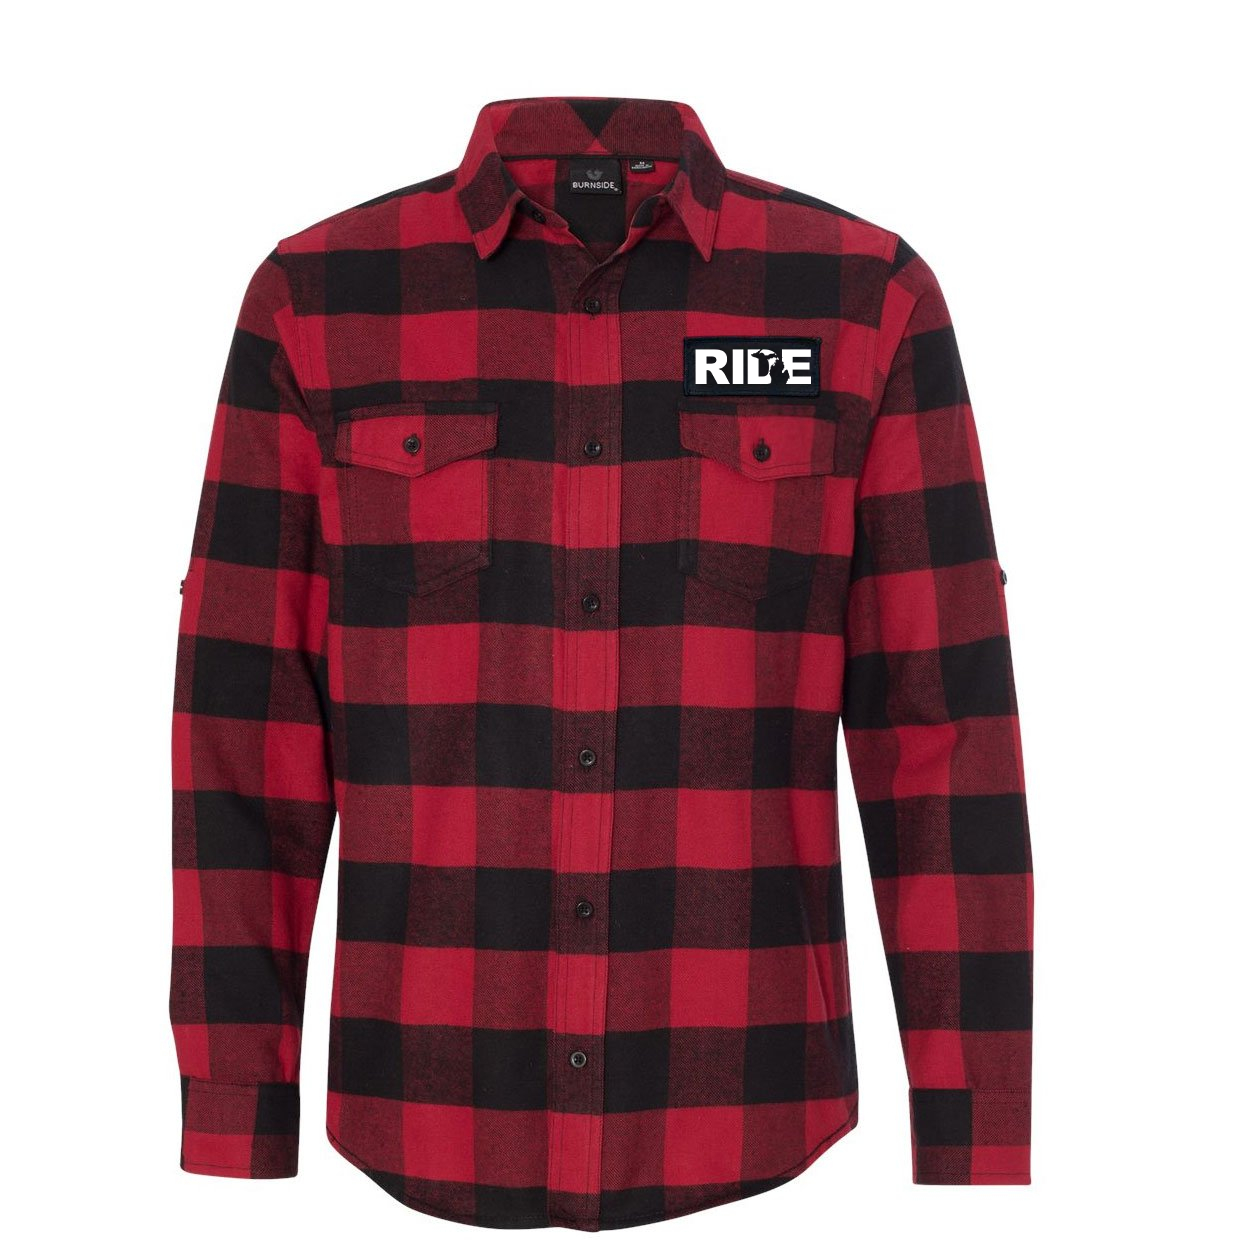 Ride Michigan Classic Unisex Long Sleeve Woven Patch Flannel Shirt Red/Black Buffalo (White Logo)